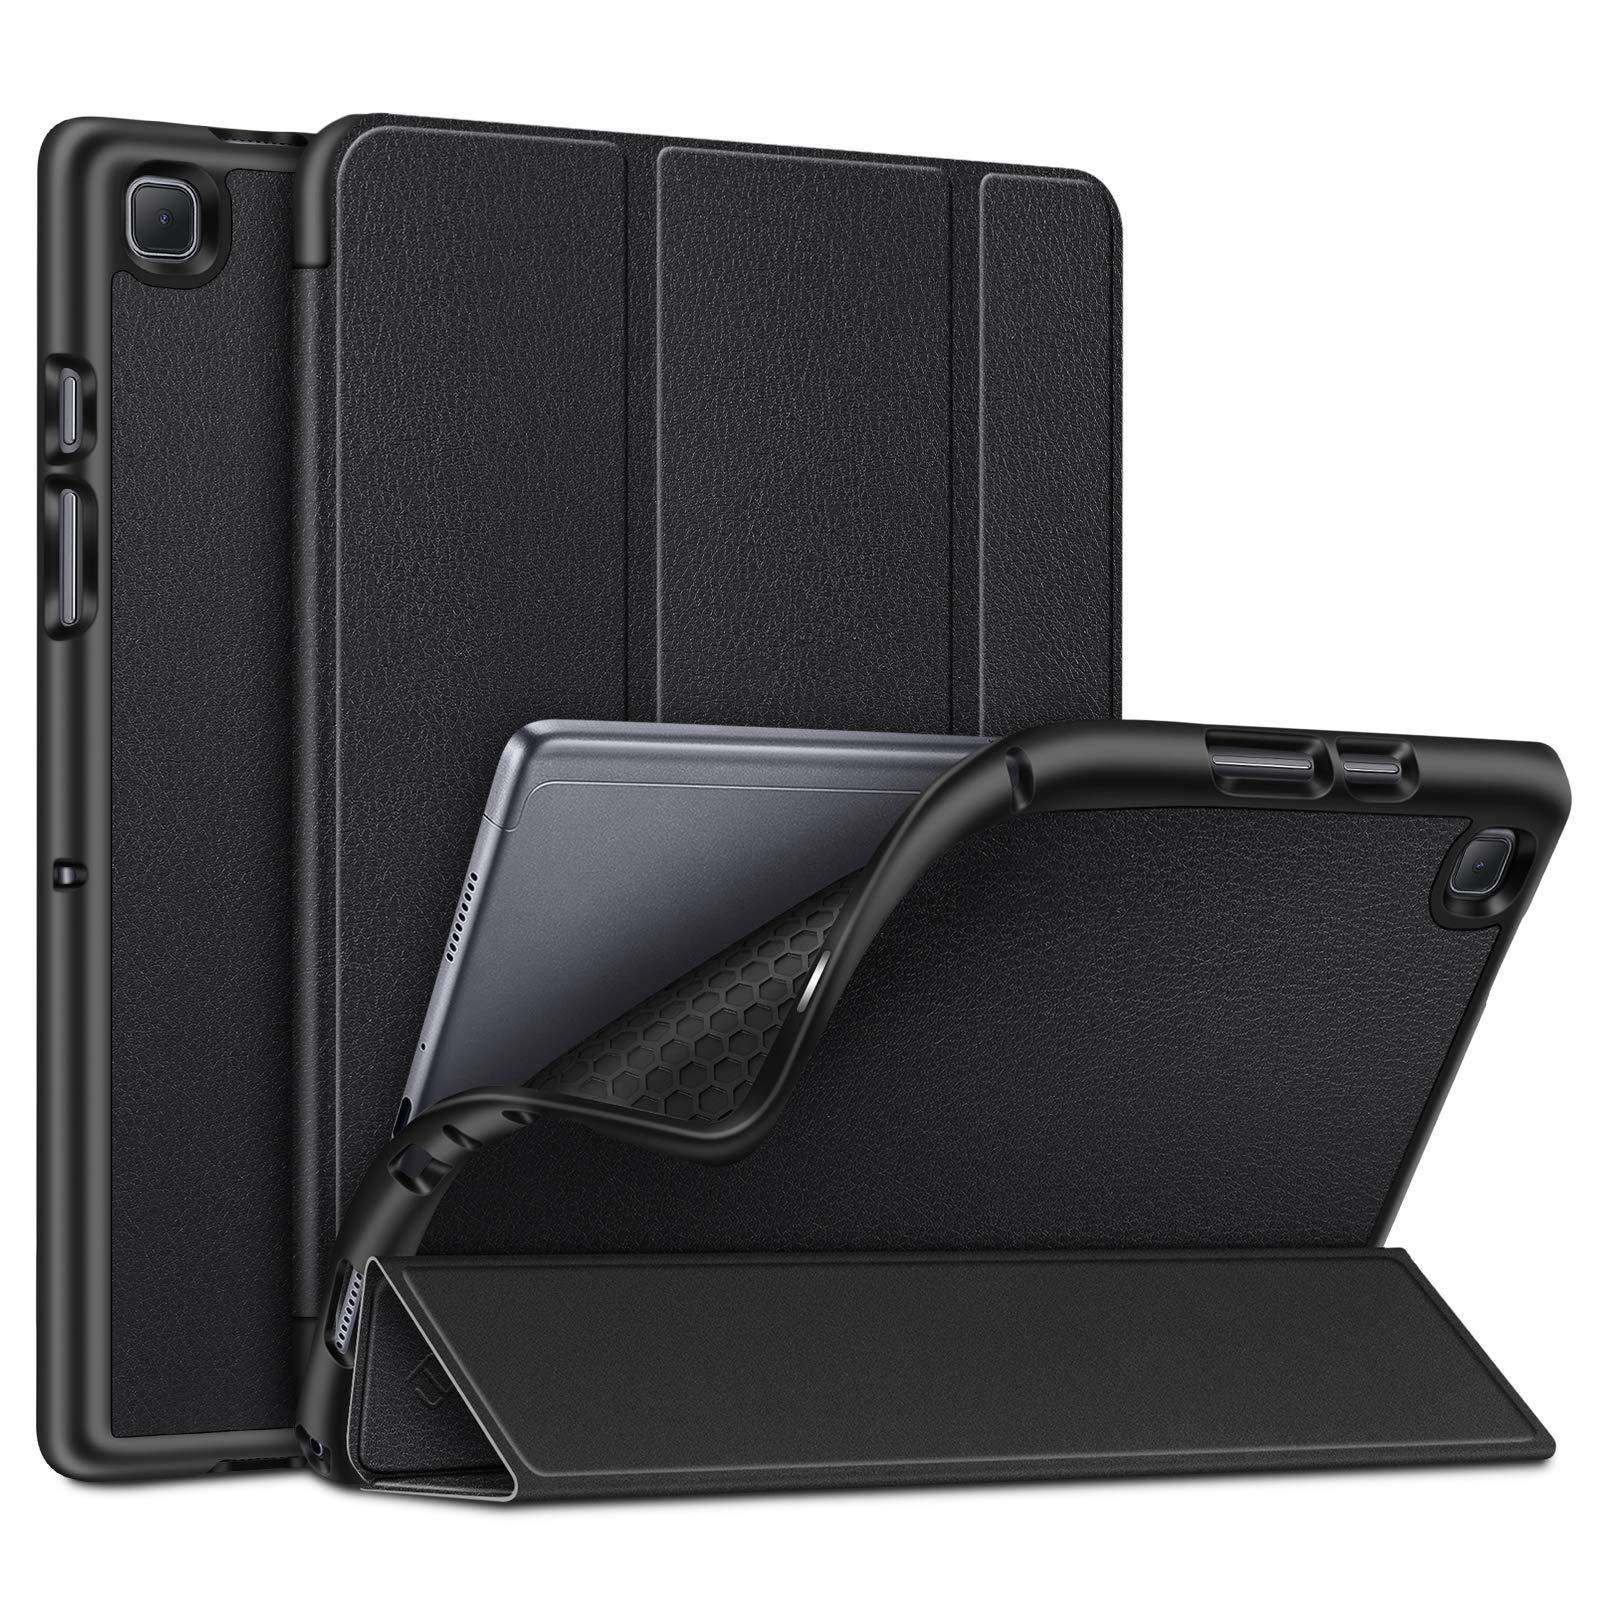 Funda para Samsung 10.4 Tab A7 SM-T500 2020 Black Fintie s